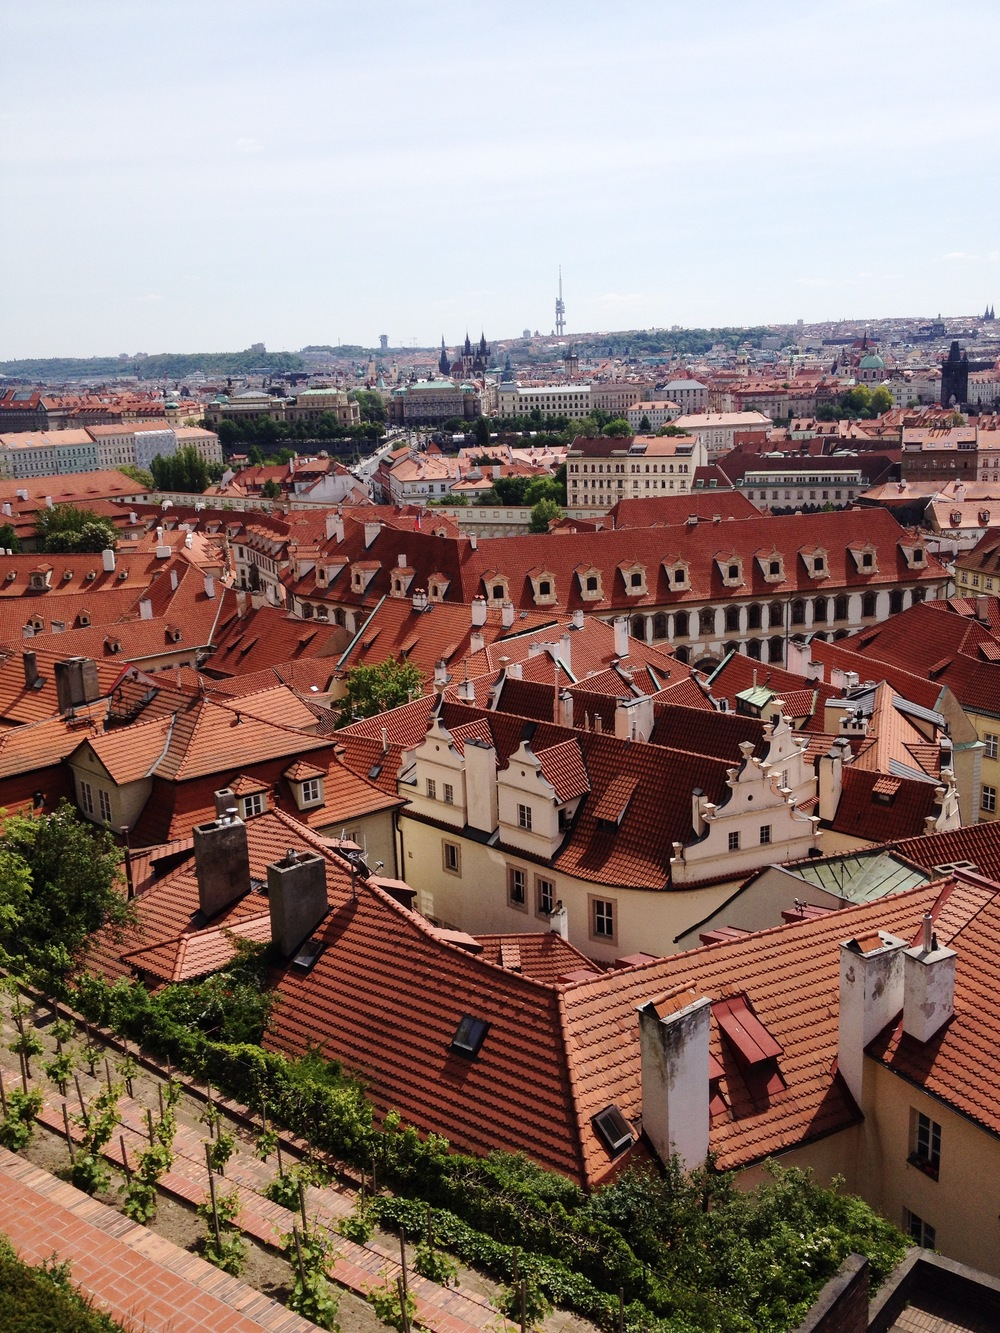 Overlook old town